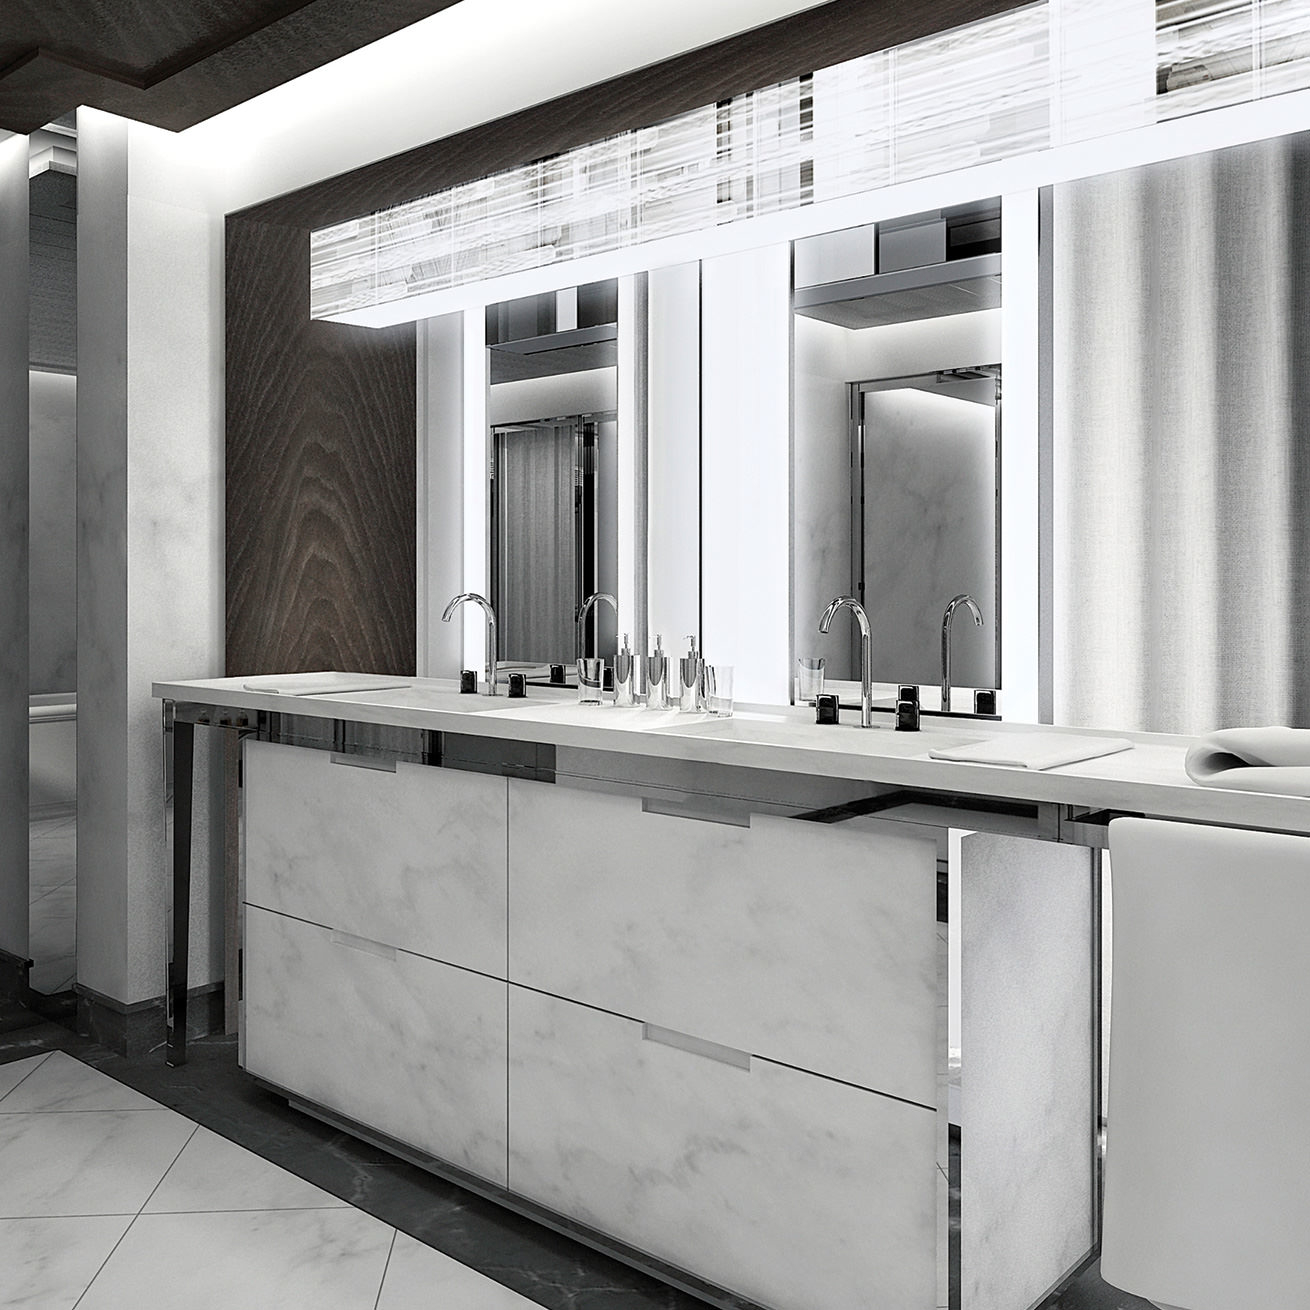 Baccarat Hotel Residences New York New York Ny Company Information